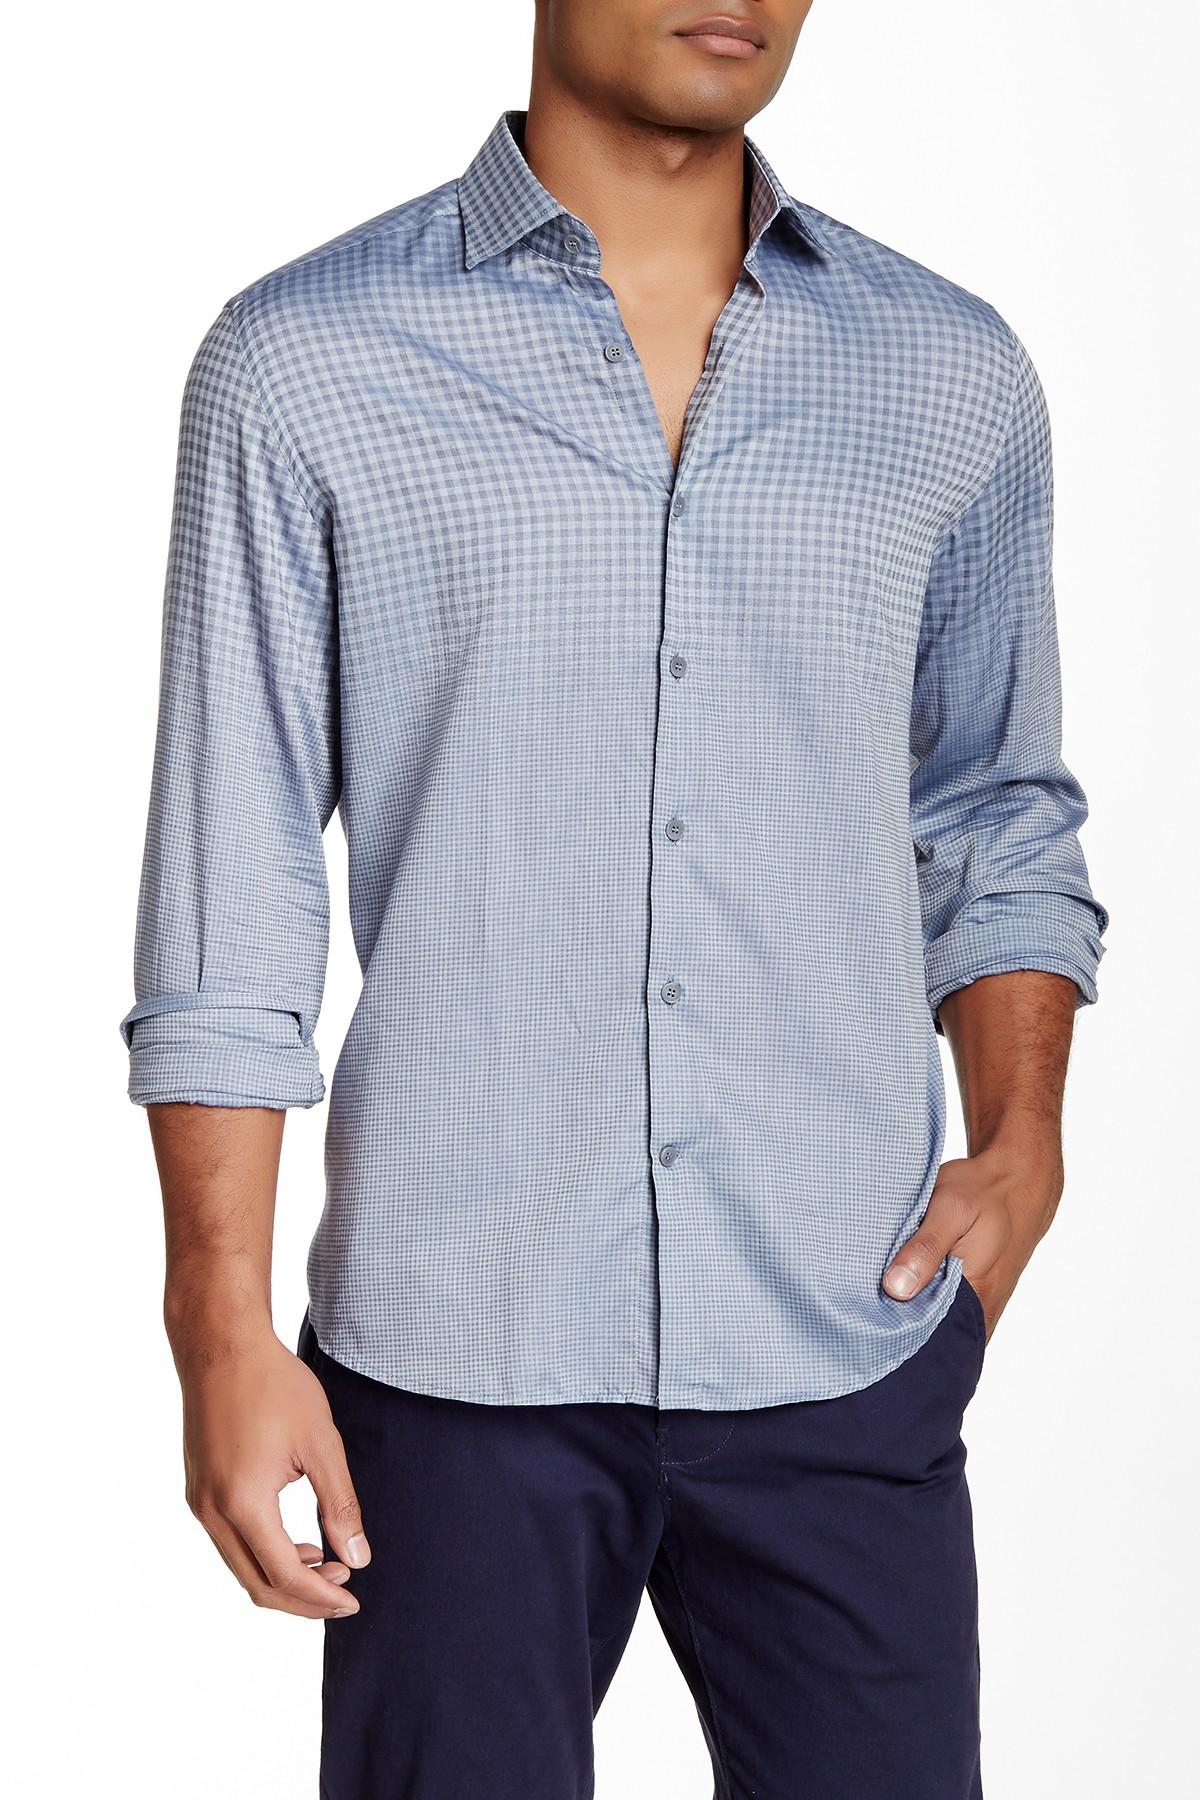 Stone Rose Woven Gradual Checkered Print Regular Fit Shirt